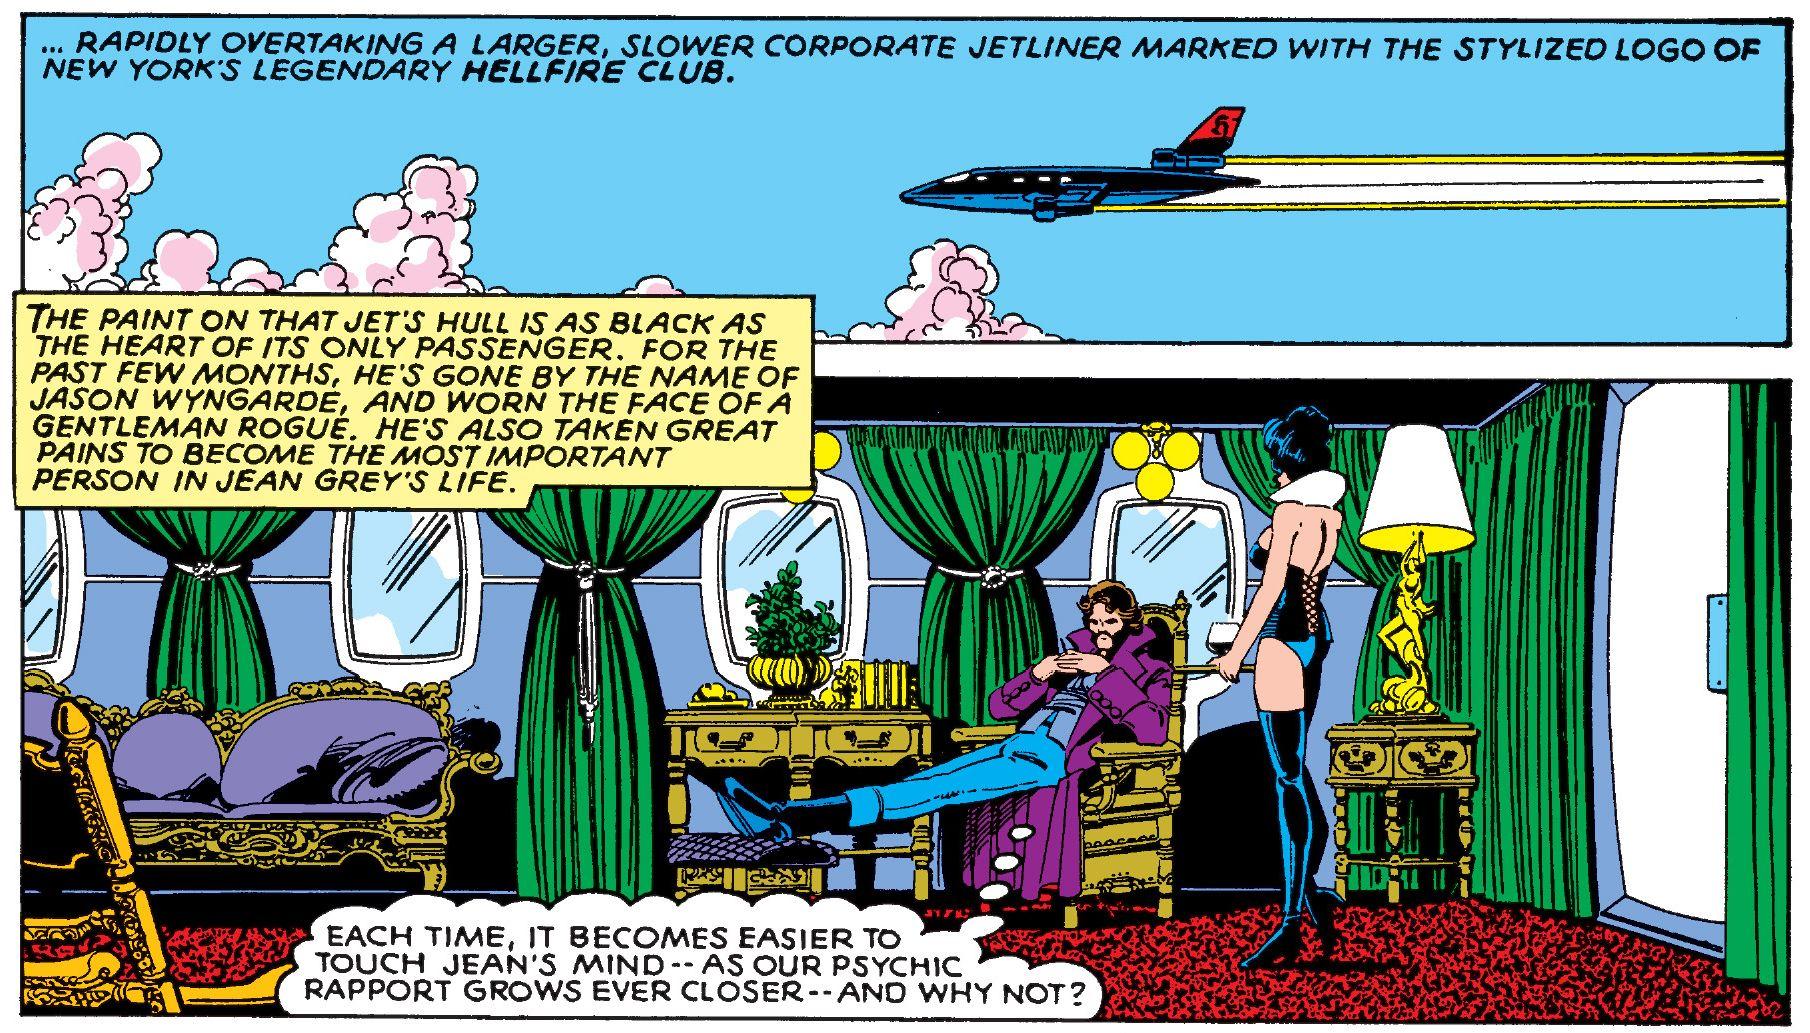 Uncanny X-Men  #129 (Marvel, January 1980), page 3